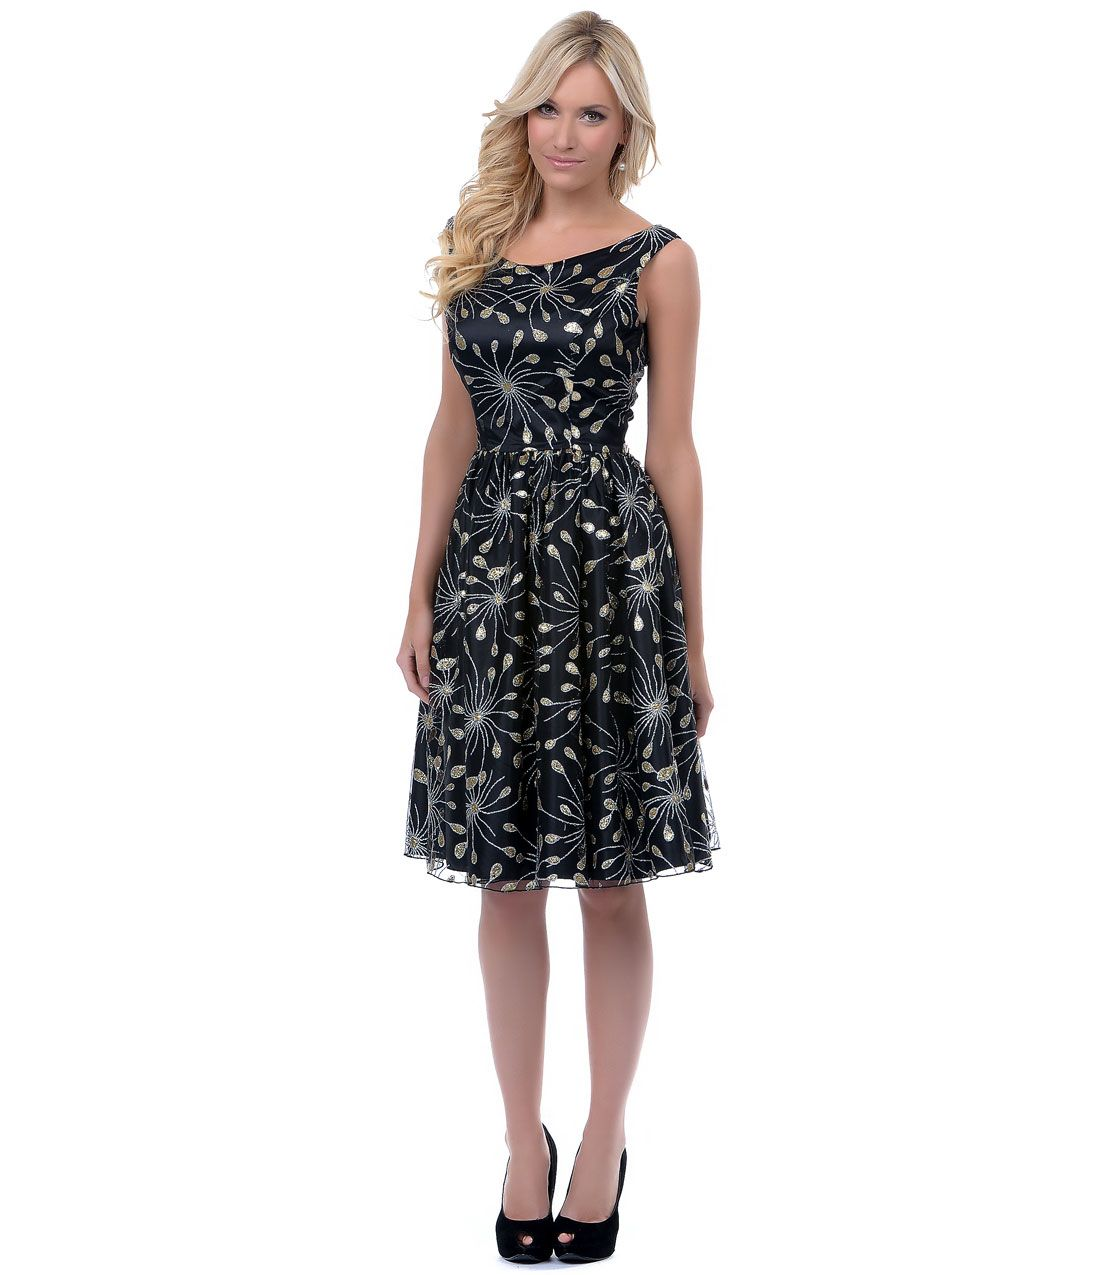 stop staring s style navy u ivory railene dress black